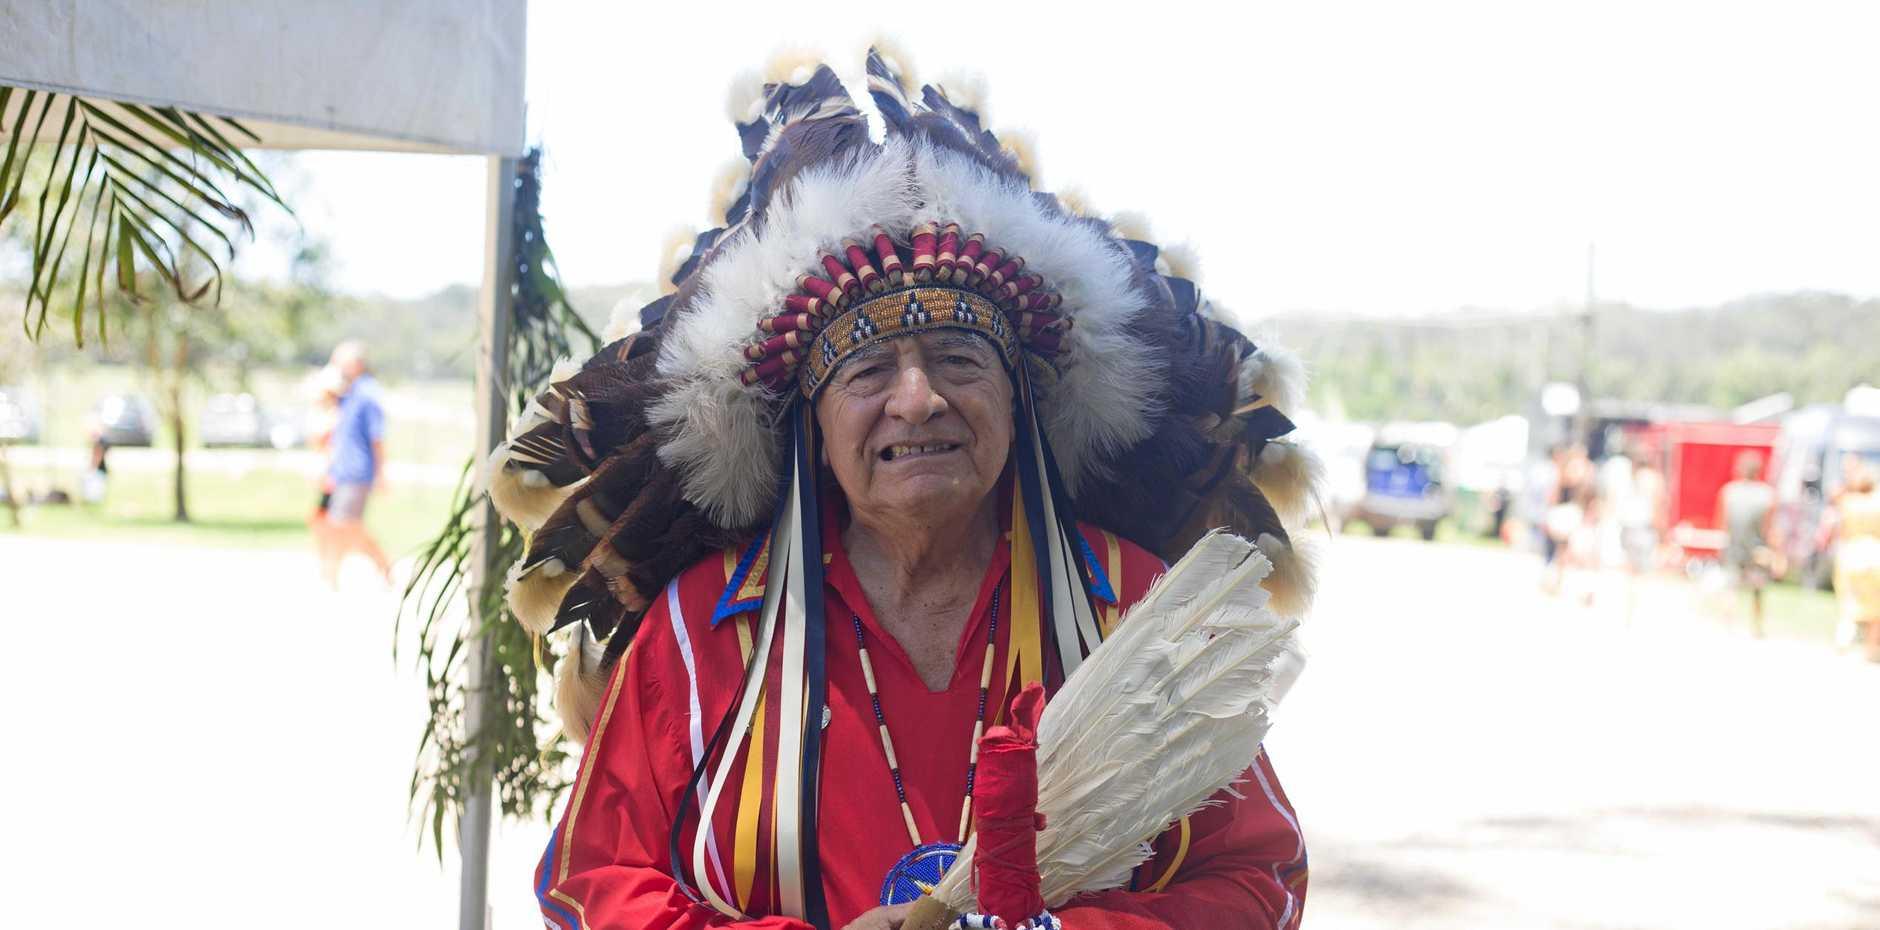 Cultural speaker Hereditary Chief Phil Lane Jr Souix Yanktomi/Chickasaw Nations.